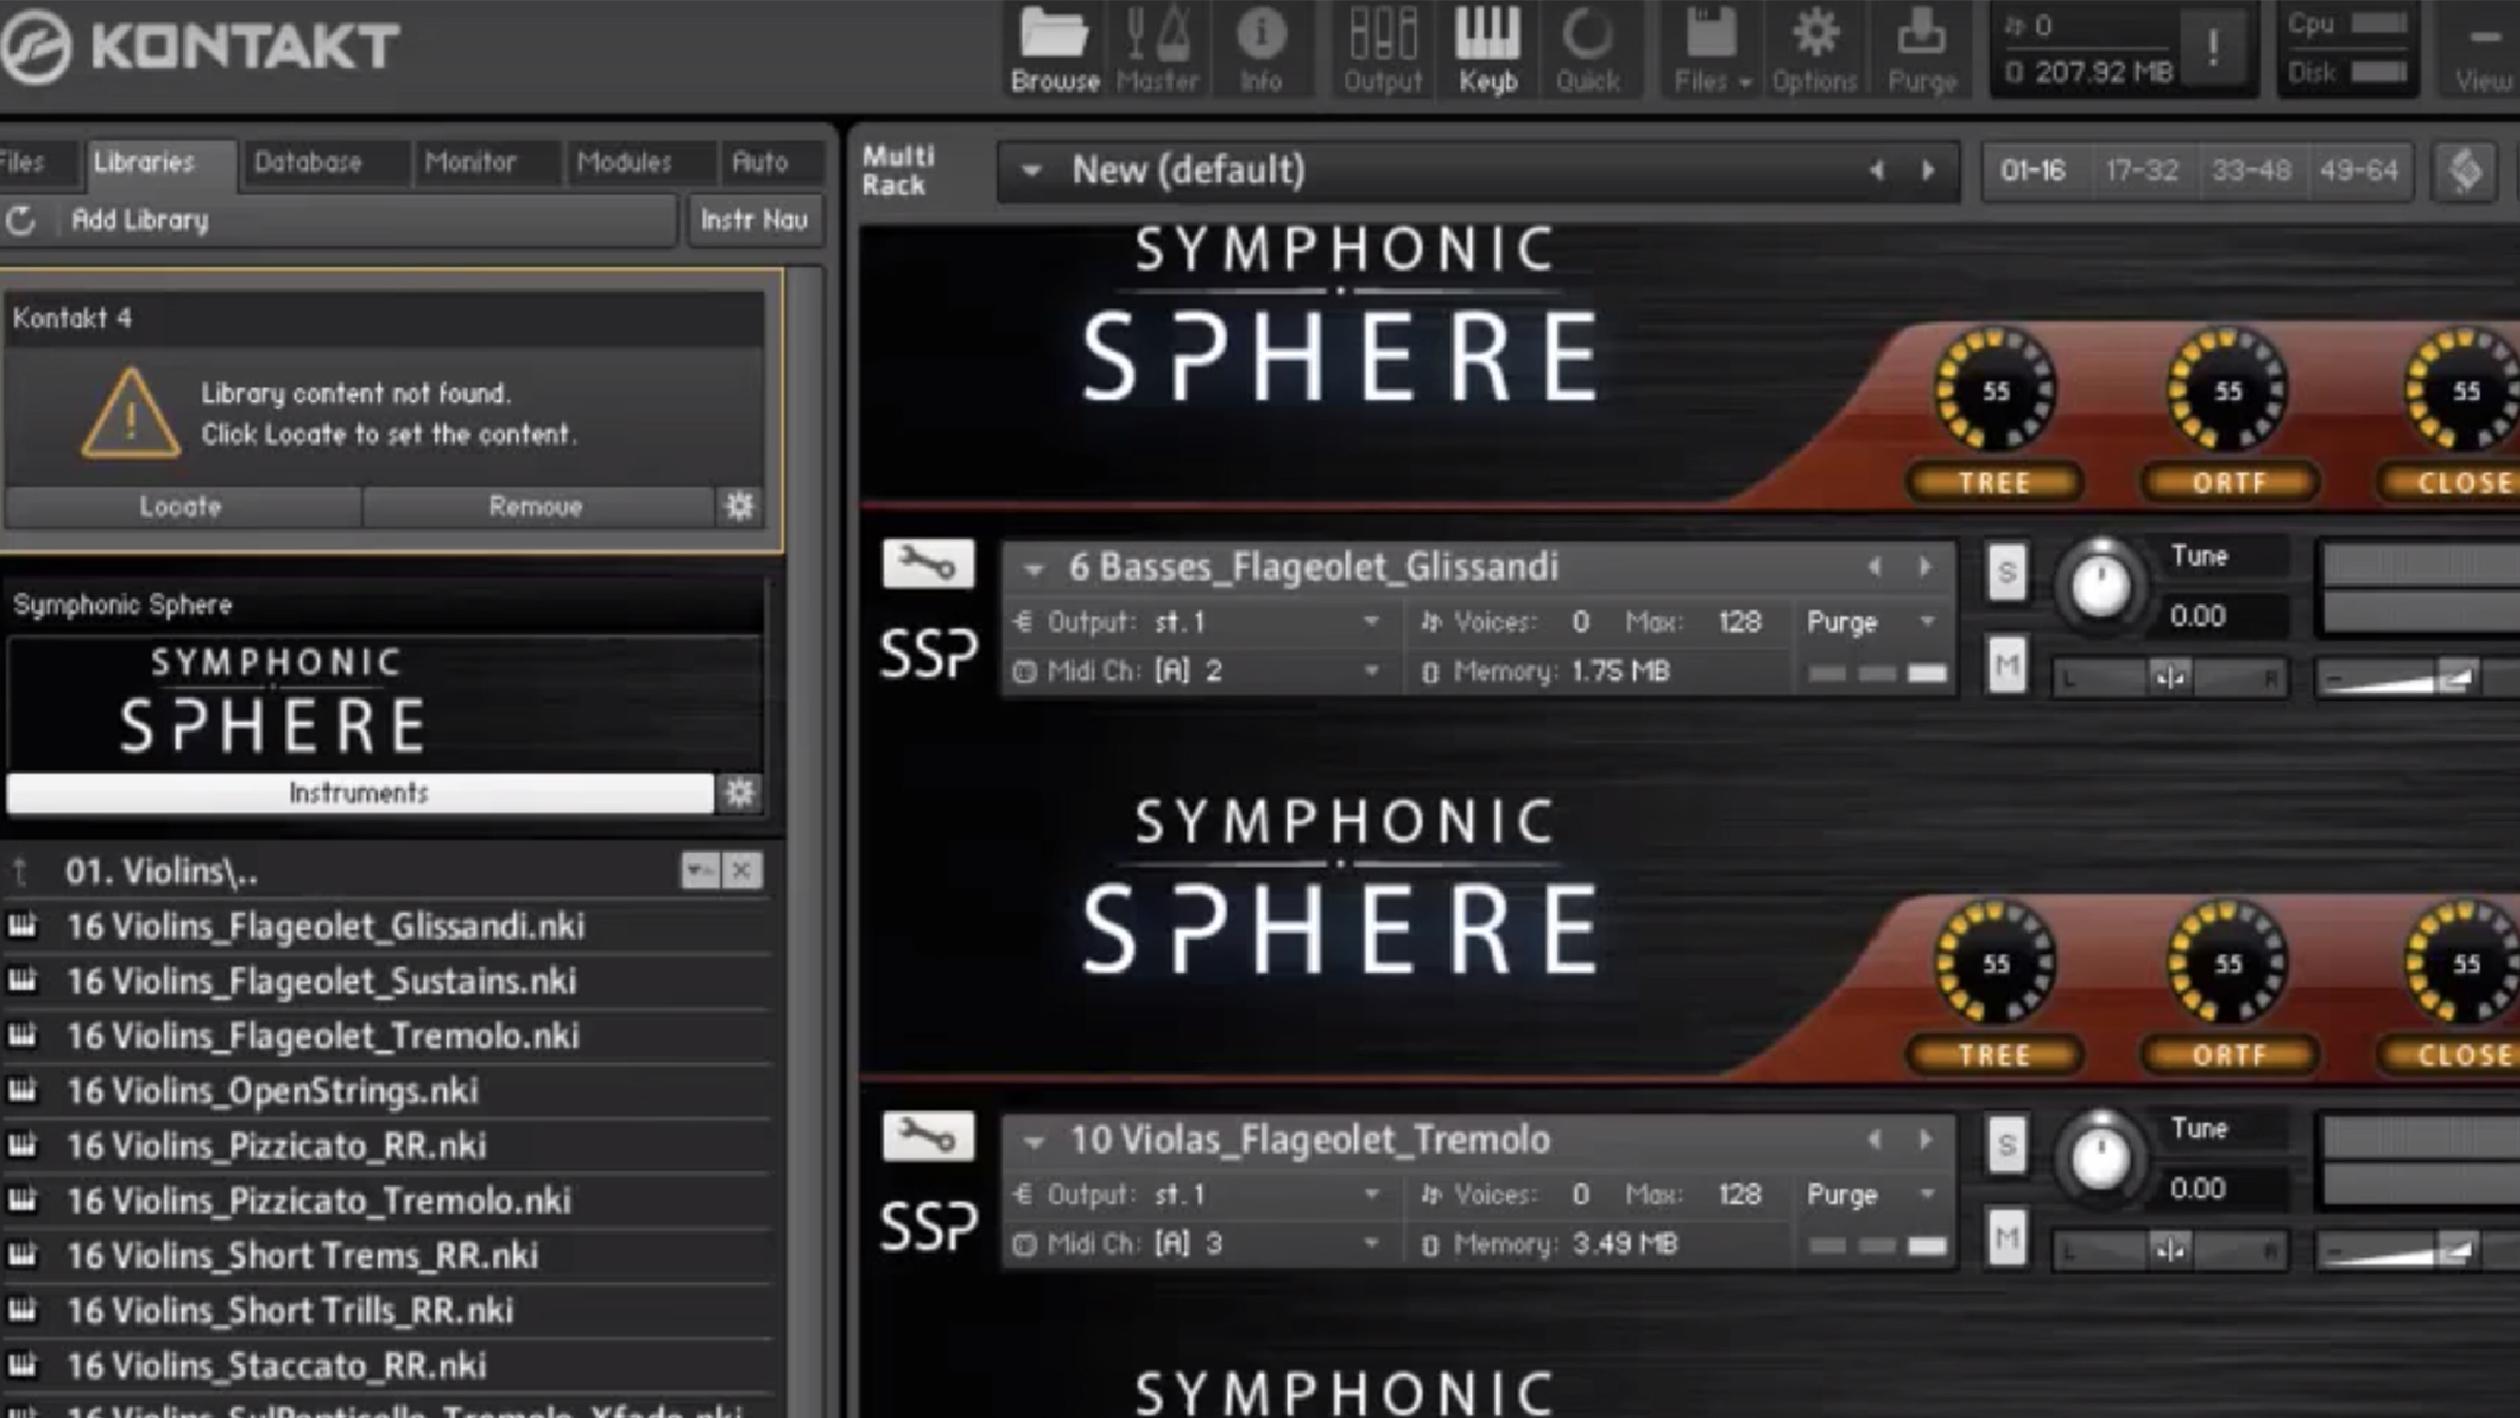 SYMPHONIC SPHERE - Harmonics/Loose/WWs